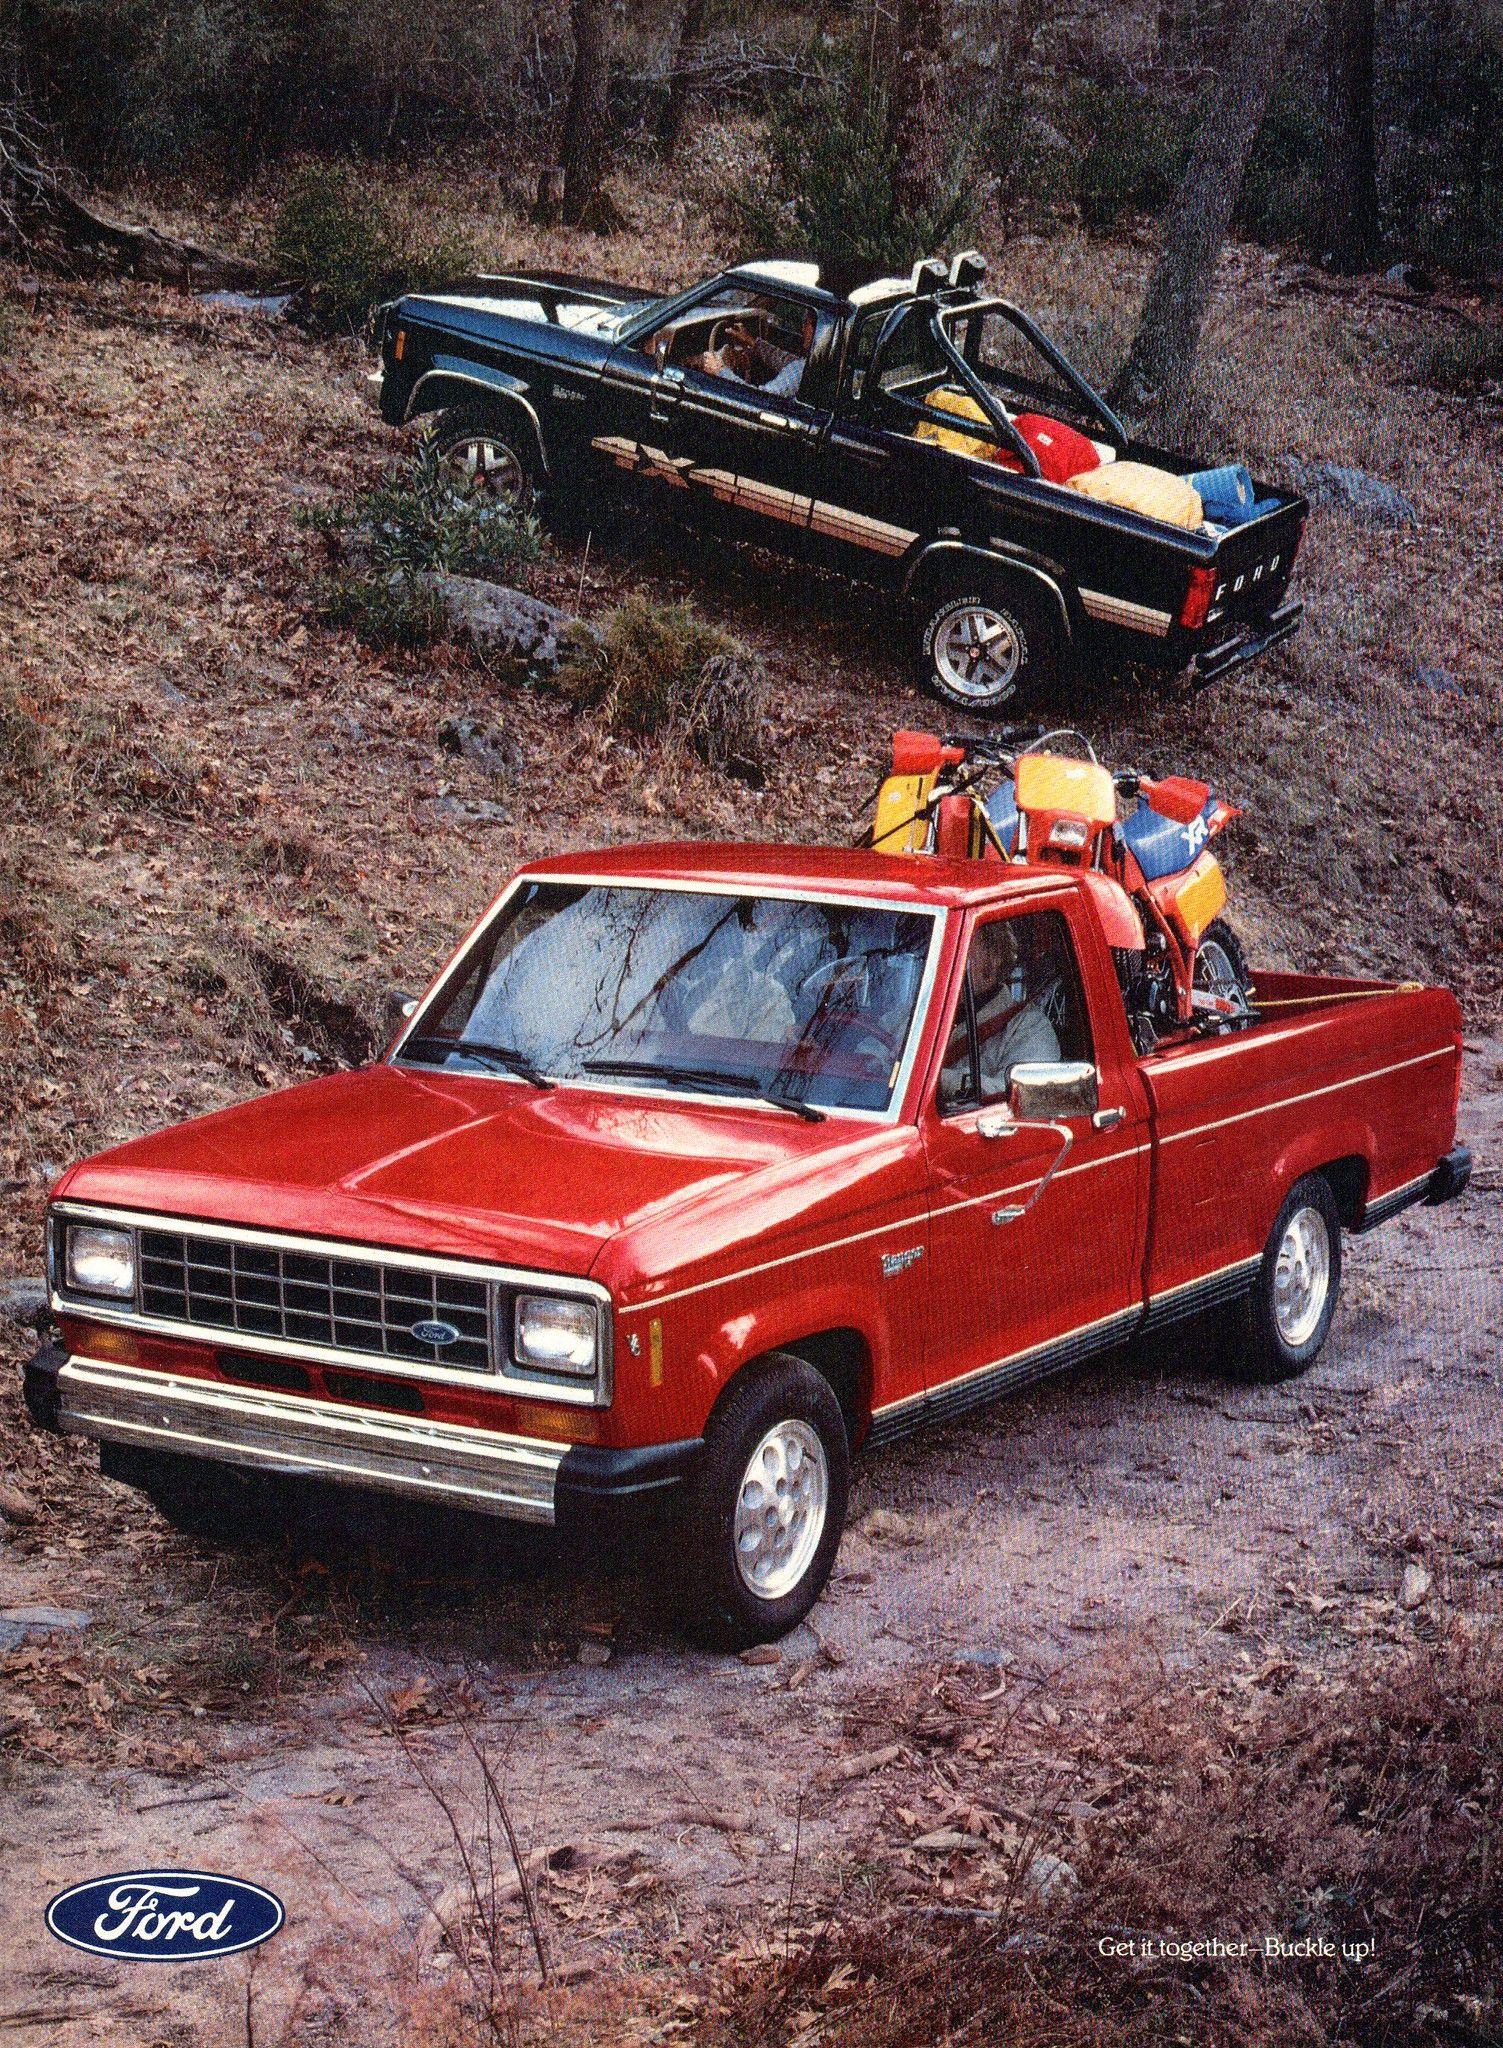 1985 Ford Ranger 4x2 4x4 Pickup Trucks Page 2 Usa Original Magazine Advertisement Ford Ranger Pickup Trucks Ford Ranger Xl